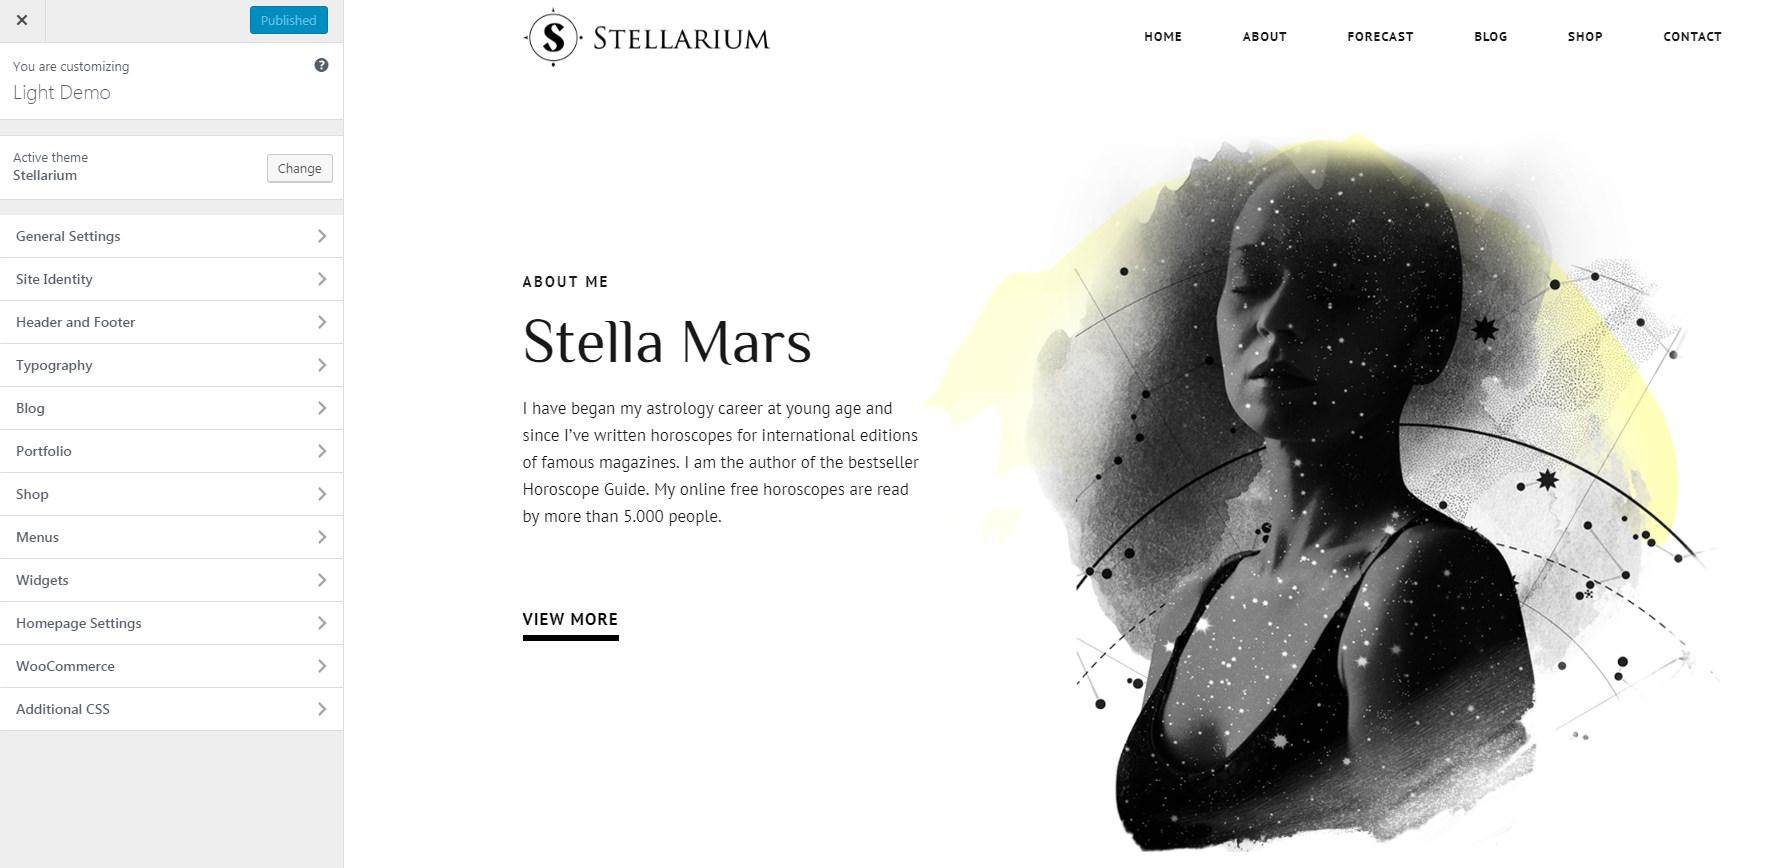 https://documentation.bold-themes.com/stellarium/wp-content/uploads/sites/34/2018/06/stellarium-customize-01.jpg